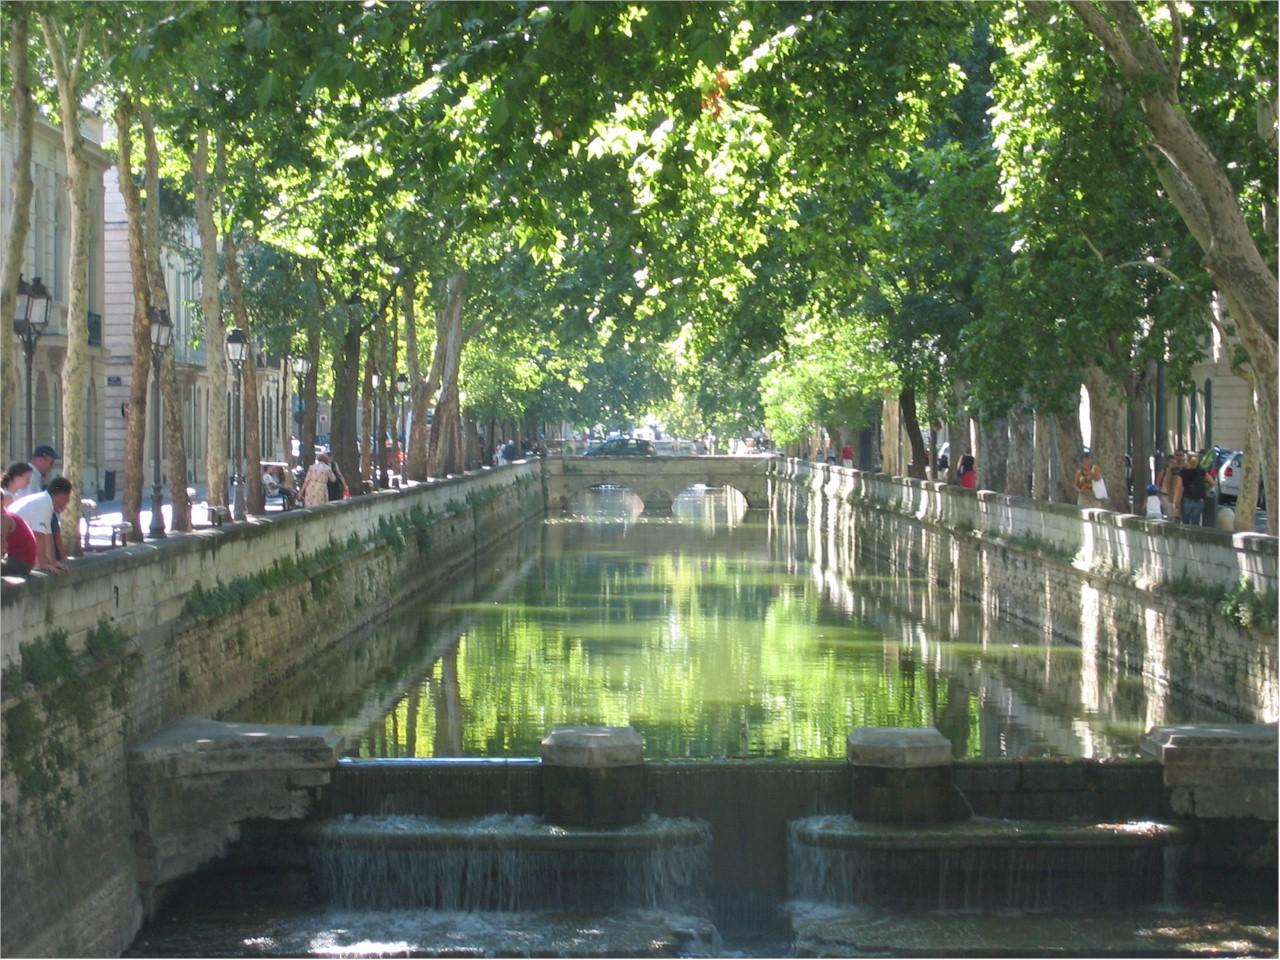 Nimes-Quais-de-la-Fontaine